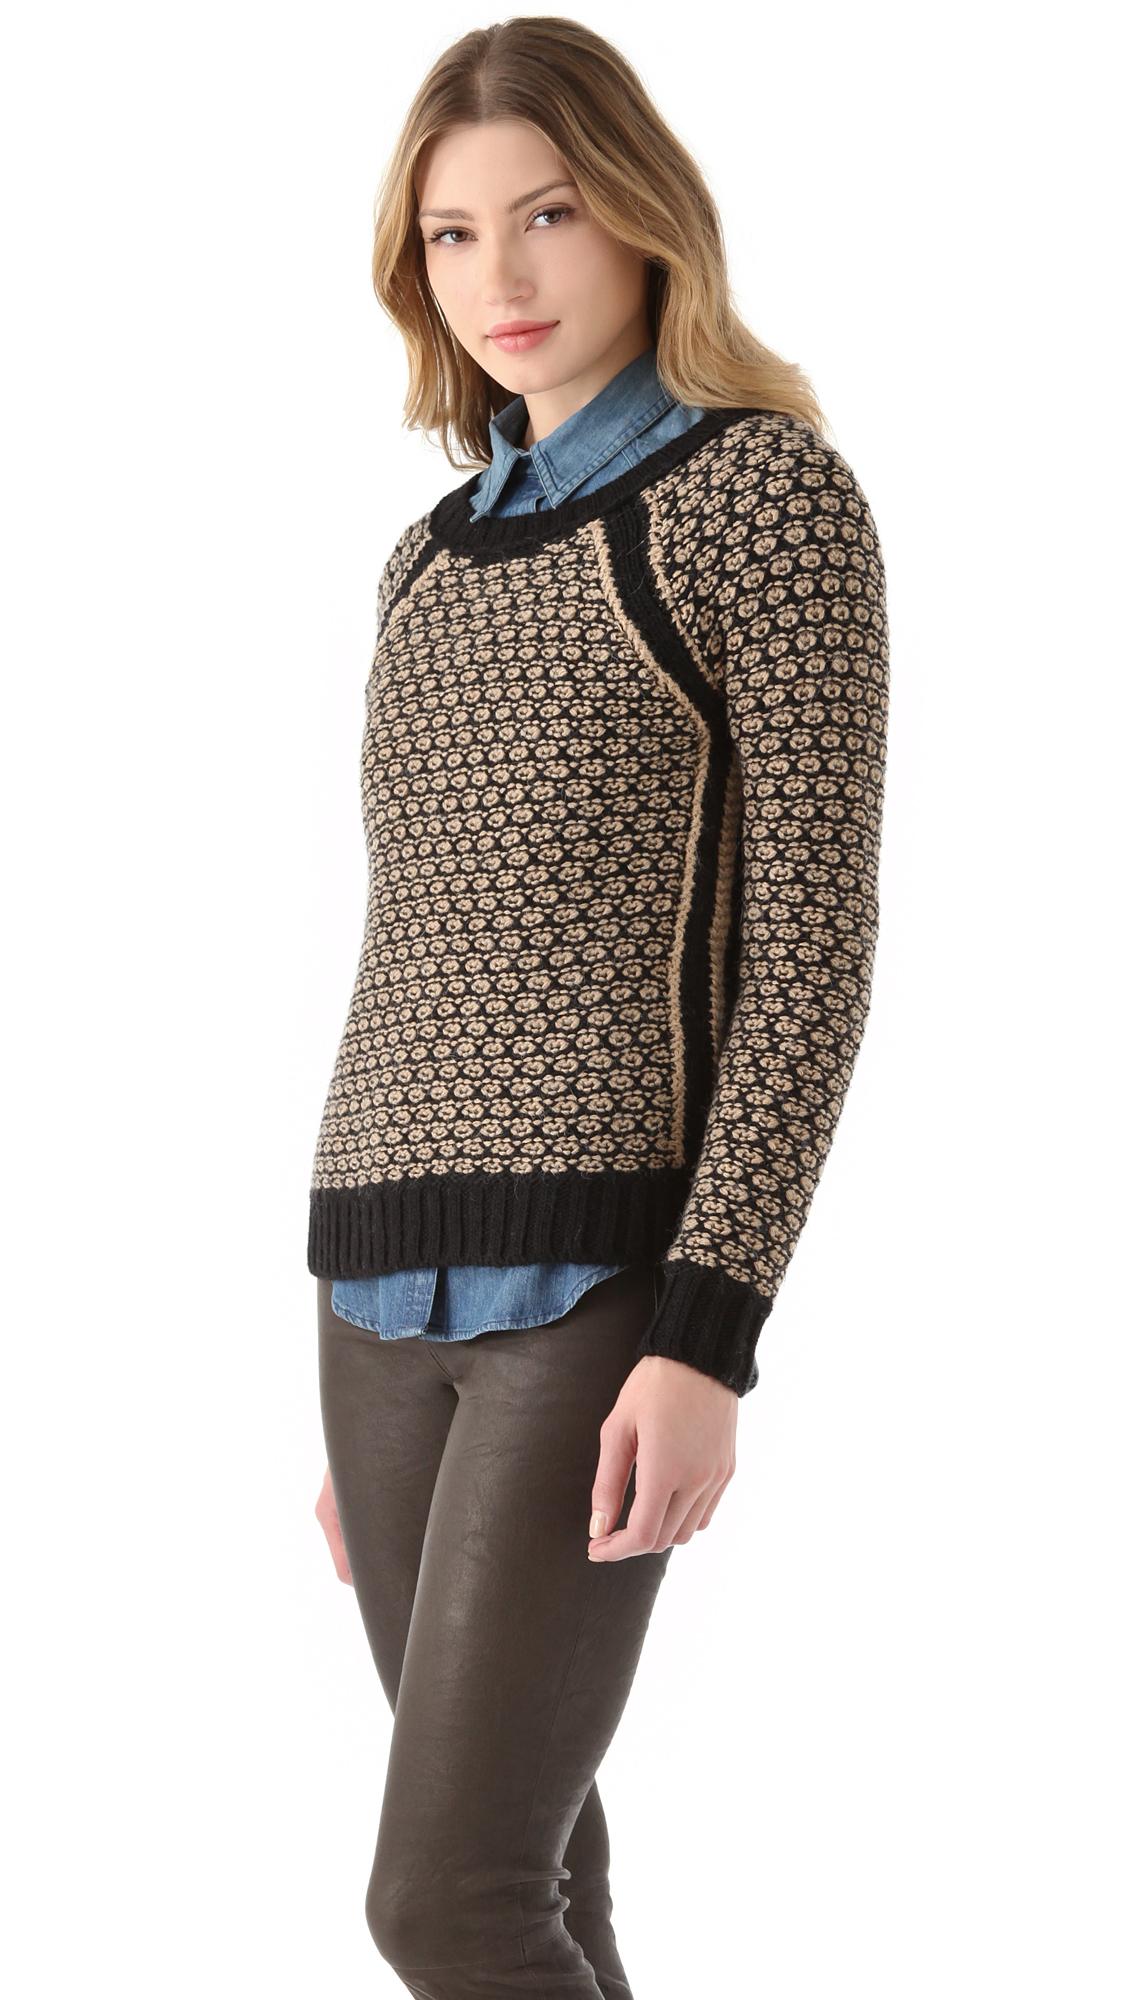 Club Monaco Jessica Sweater in Black & Camel (Black) - Lyst